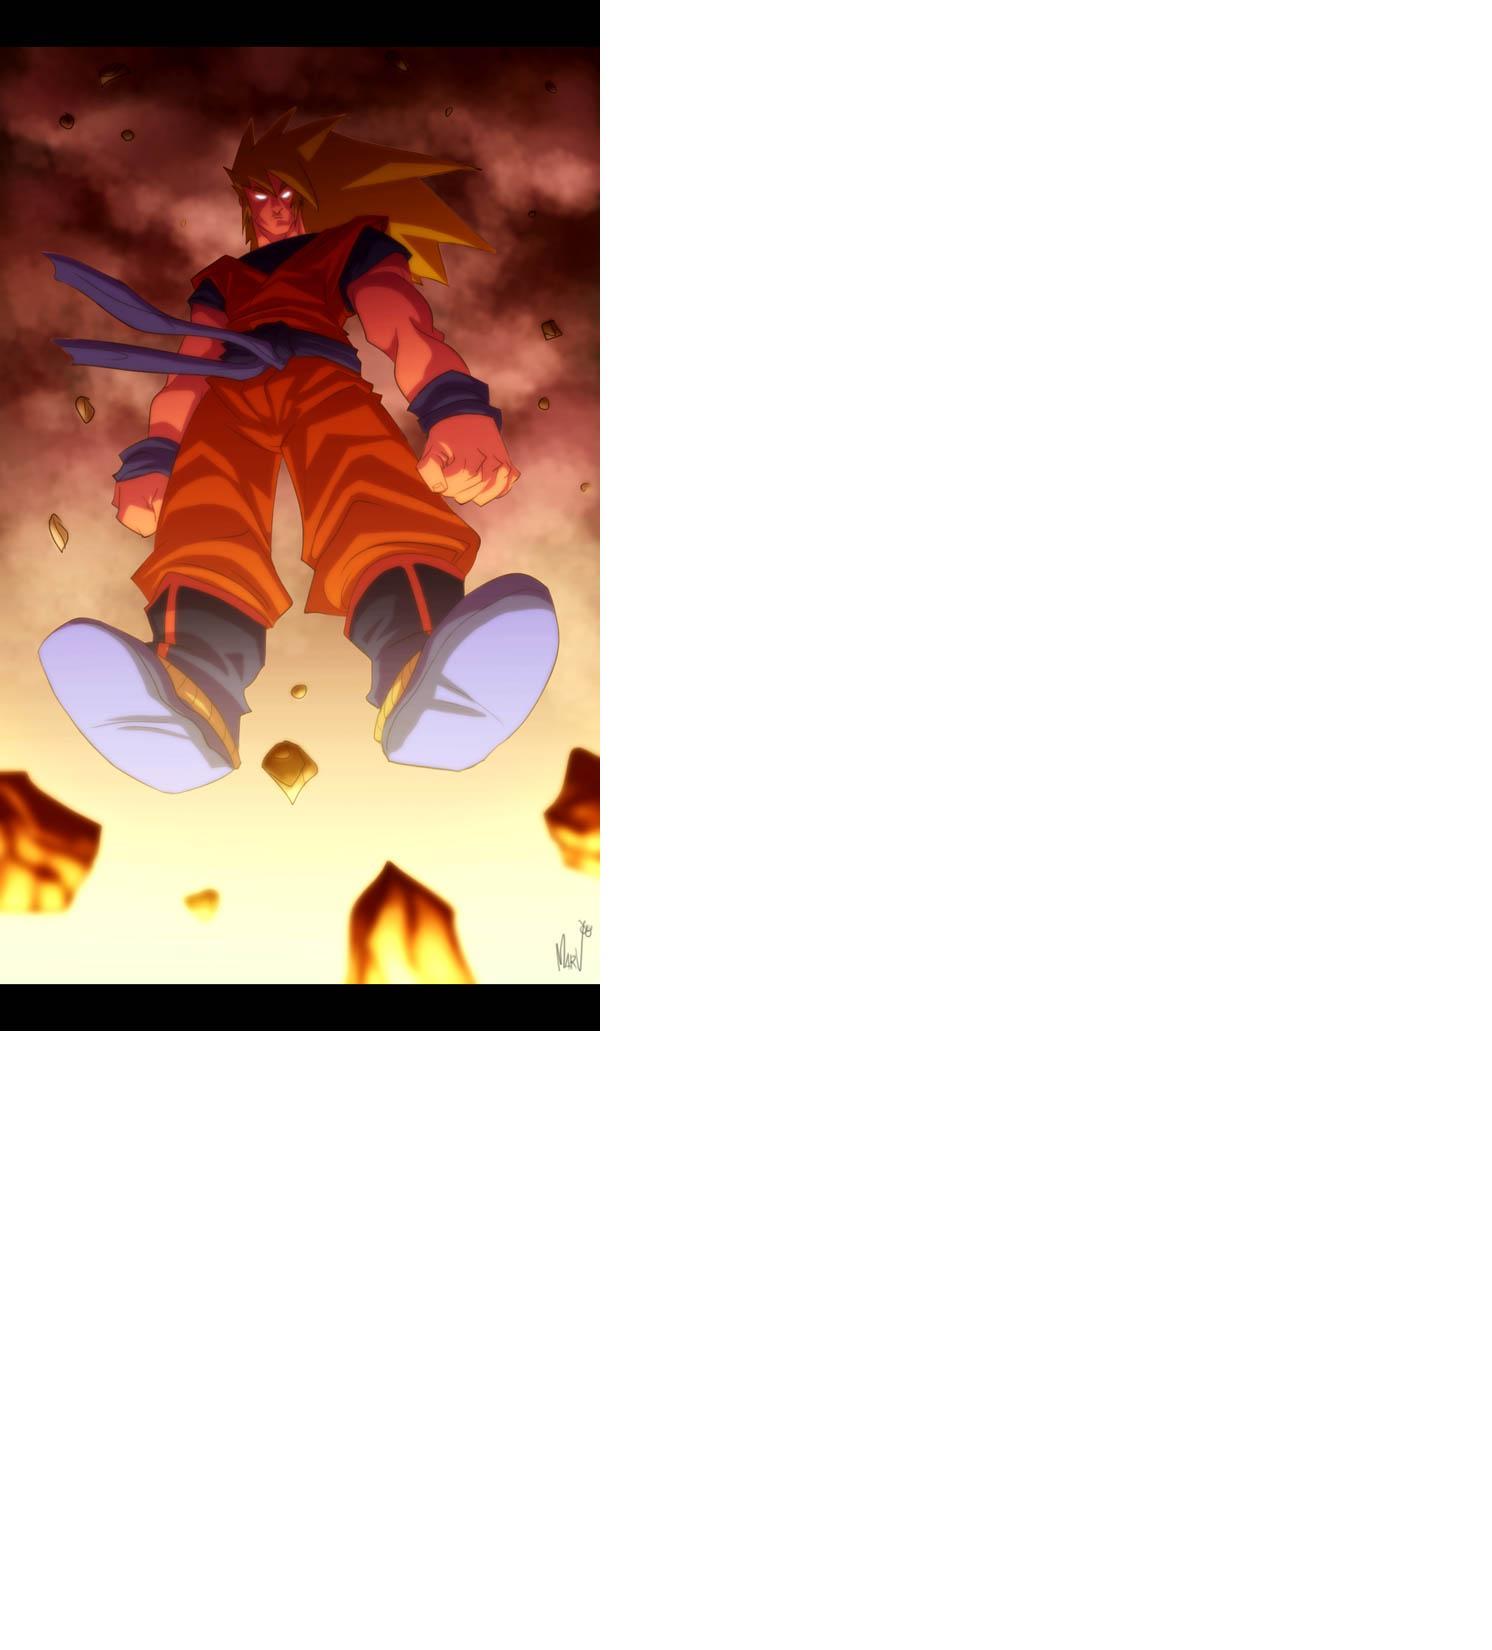 Retro Super Saiyan